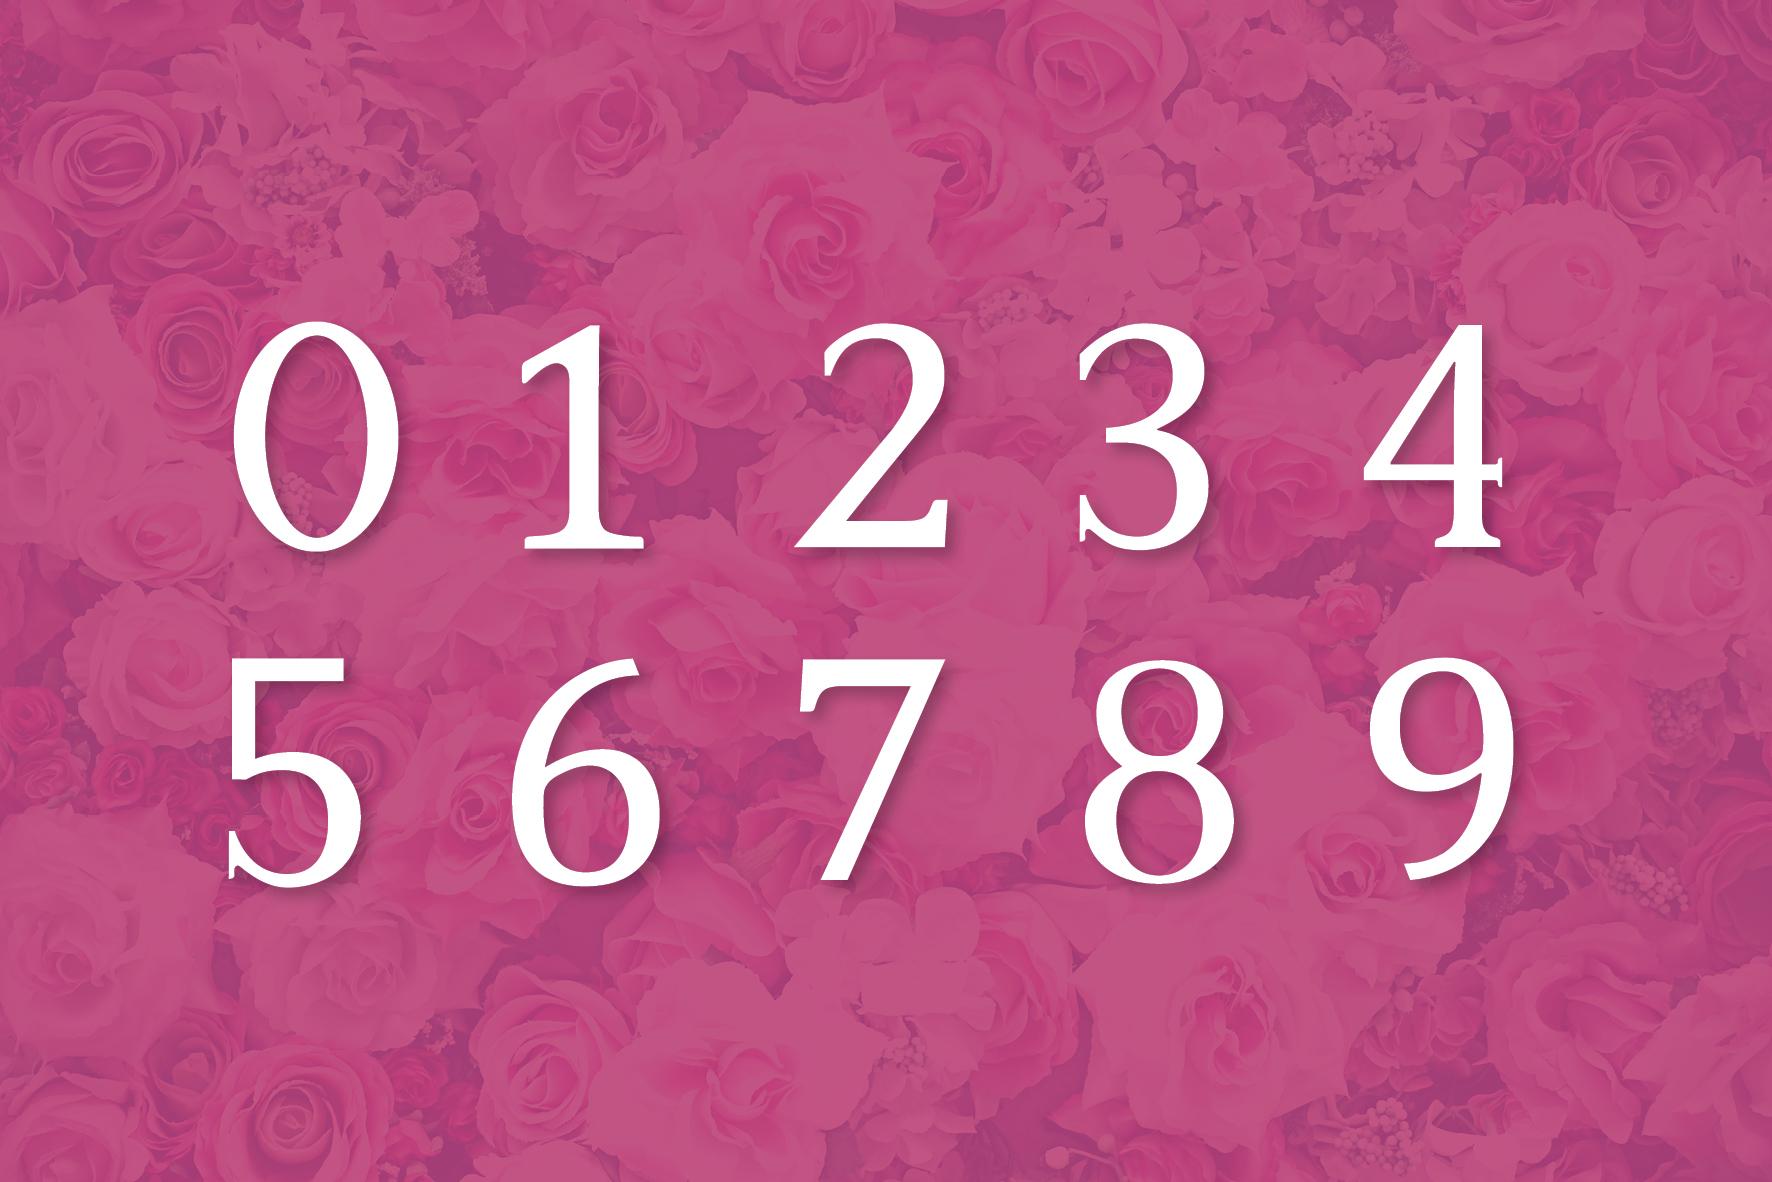 Rose Garden example image 6